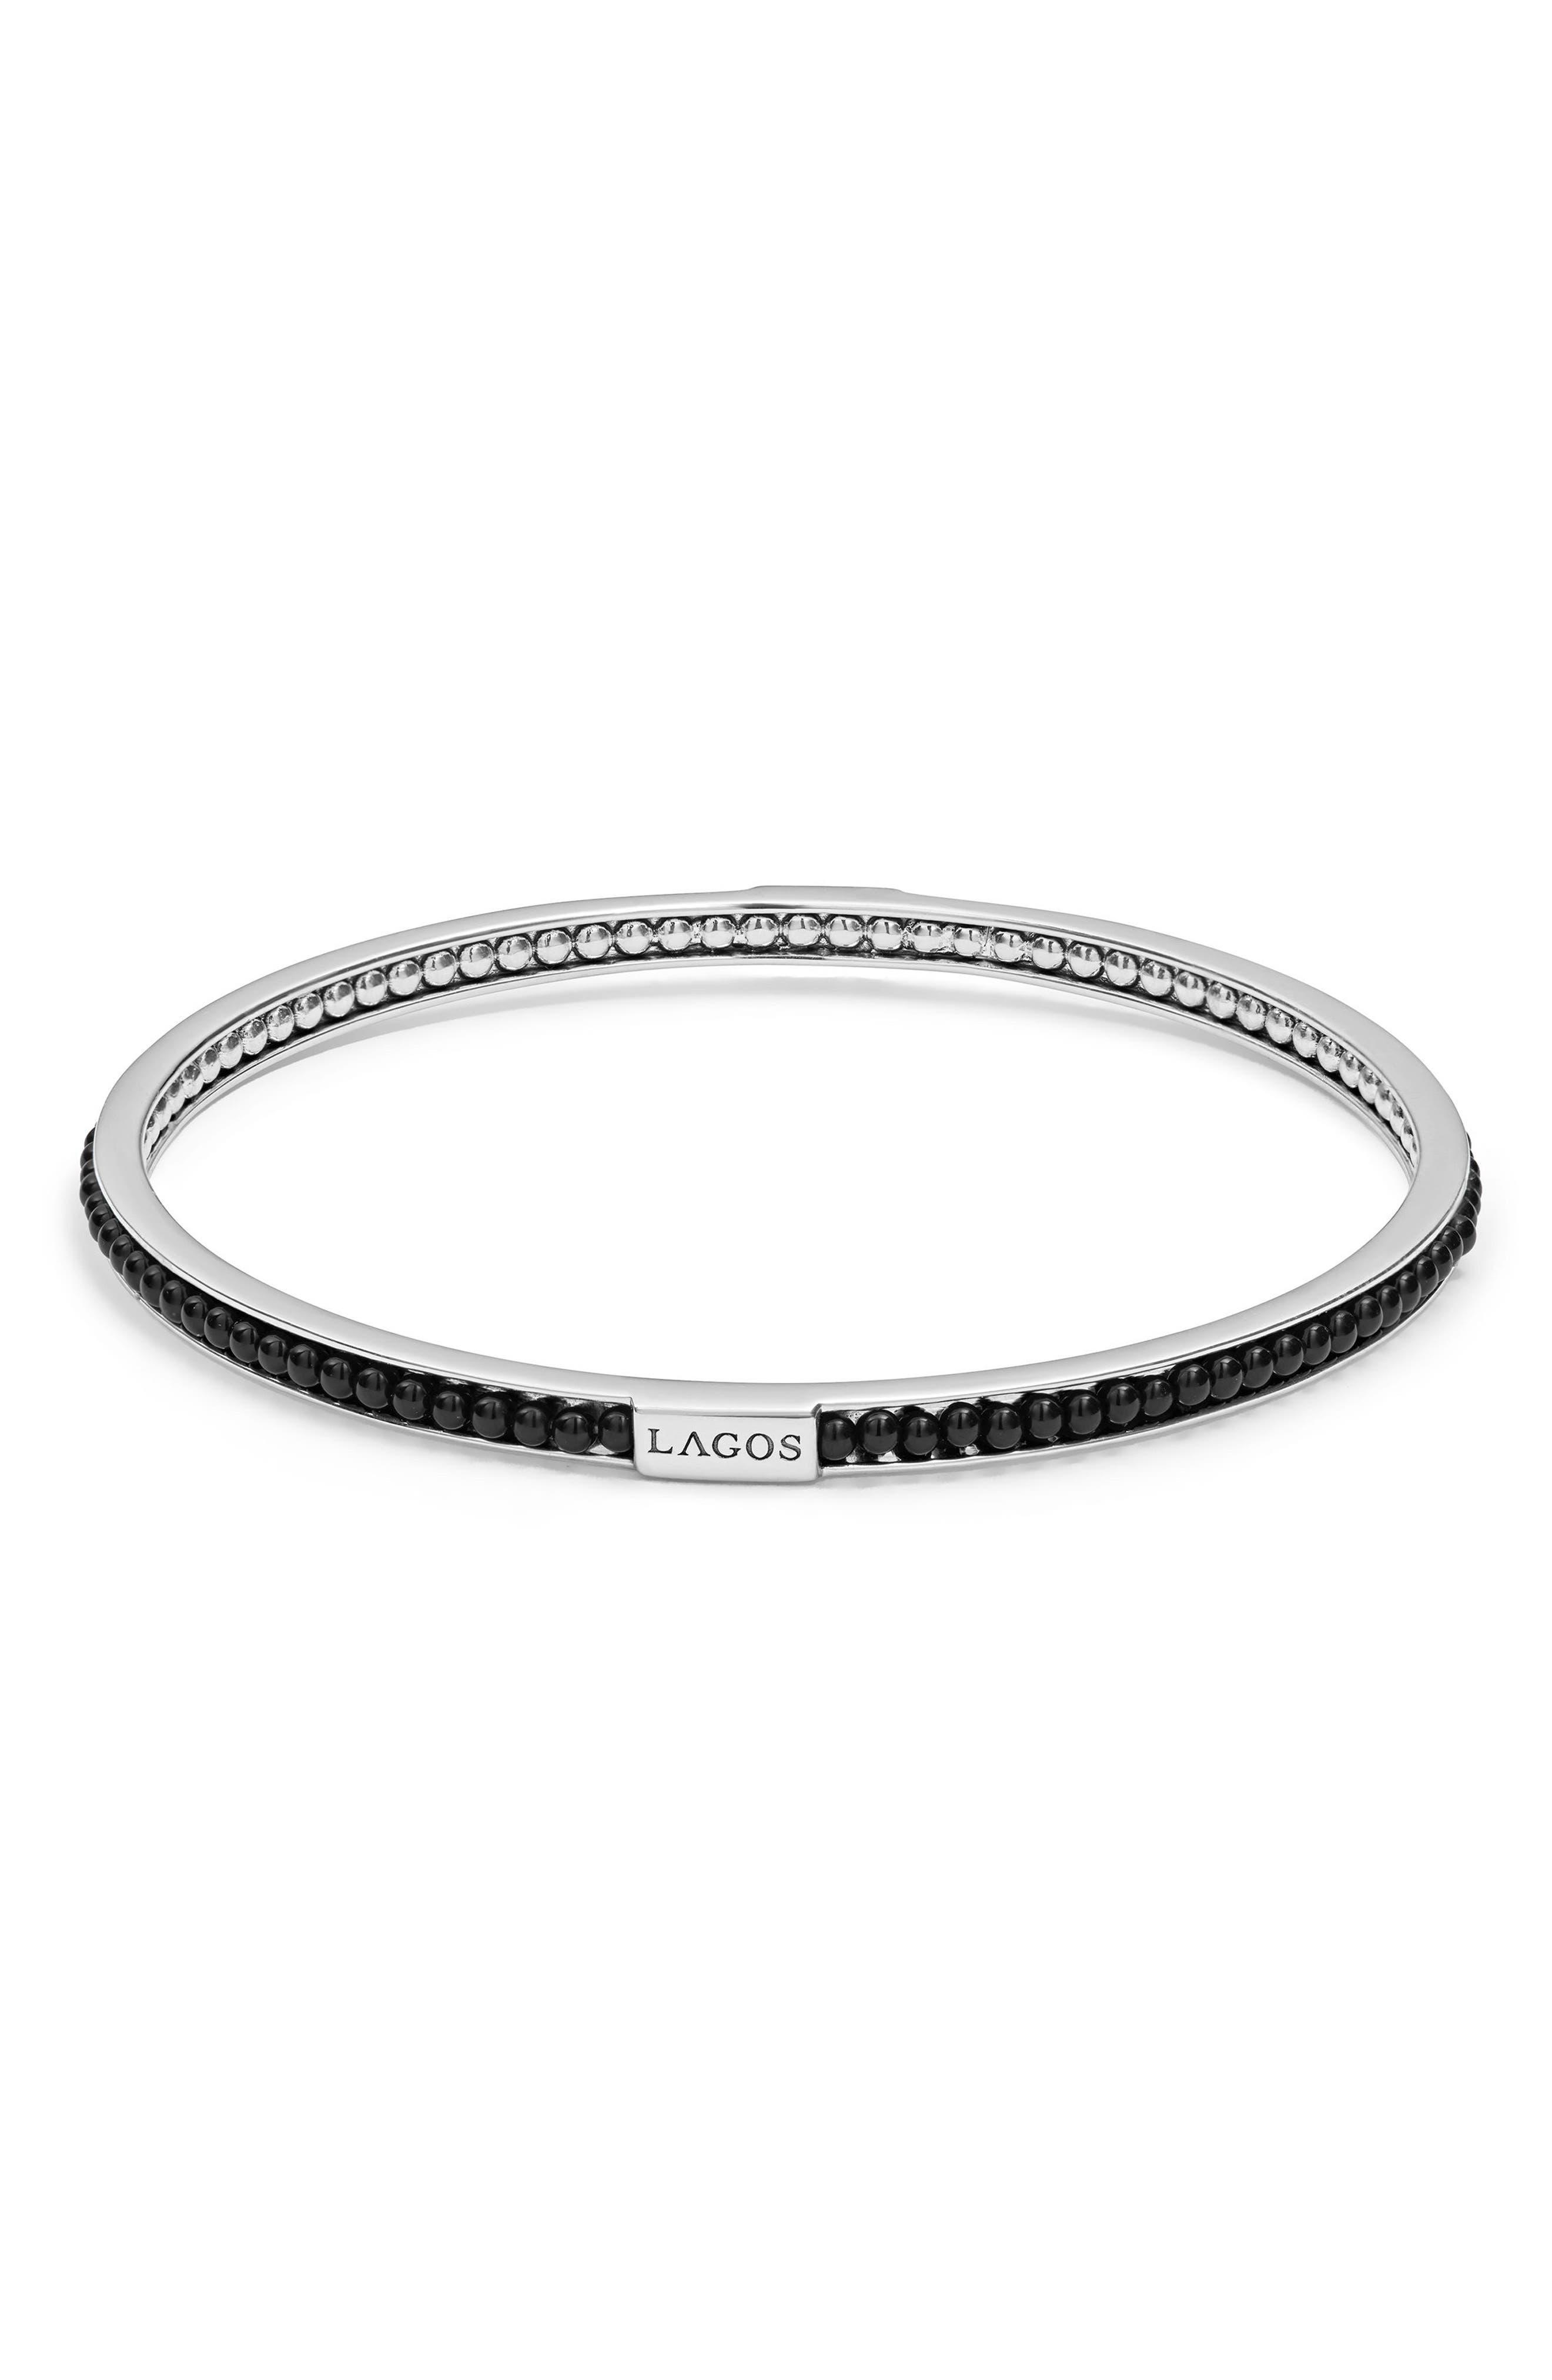 LAGOS Caviar Icon Beaded Bangle Bracelet